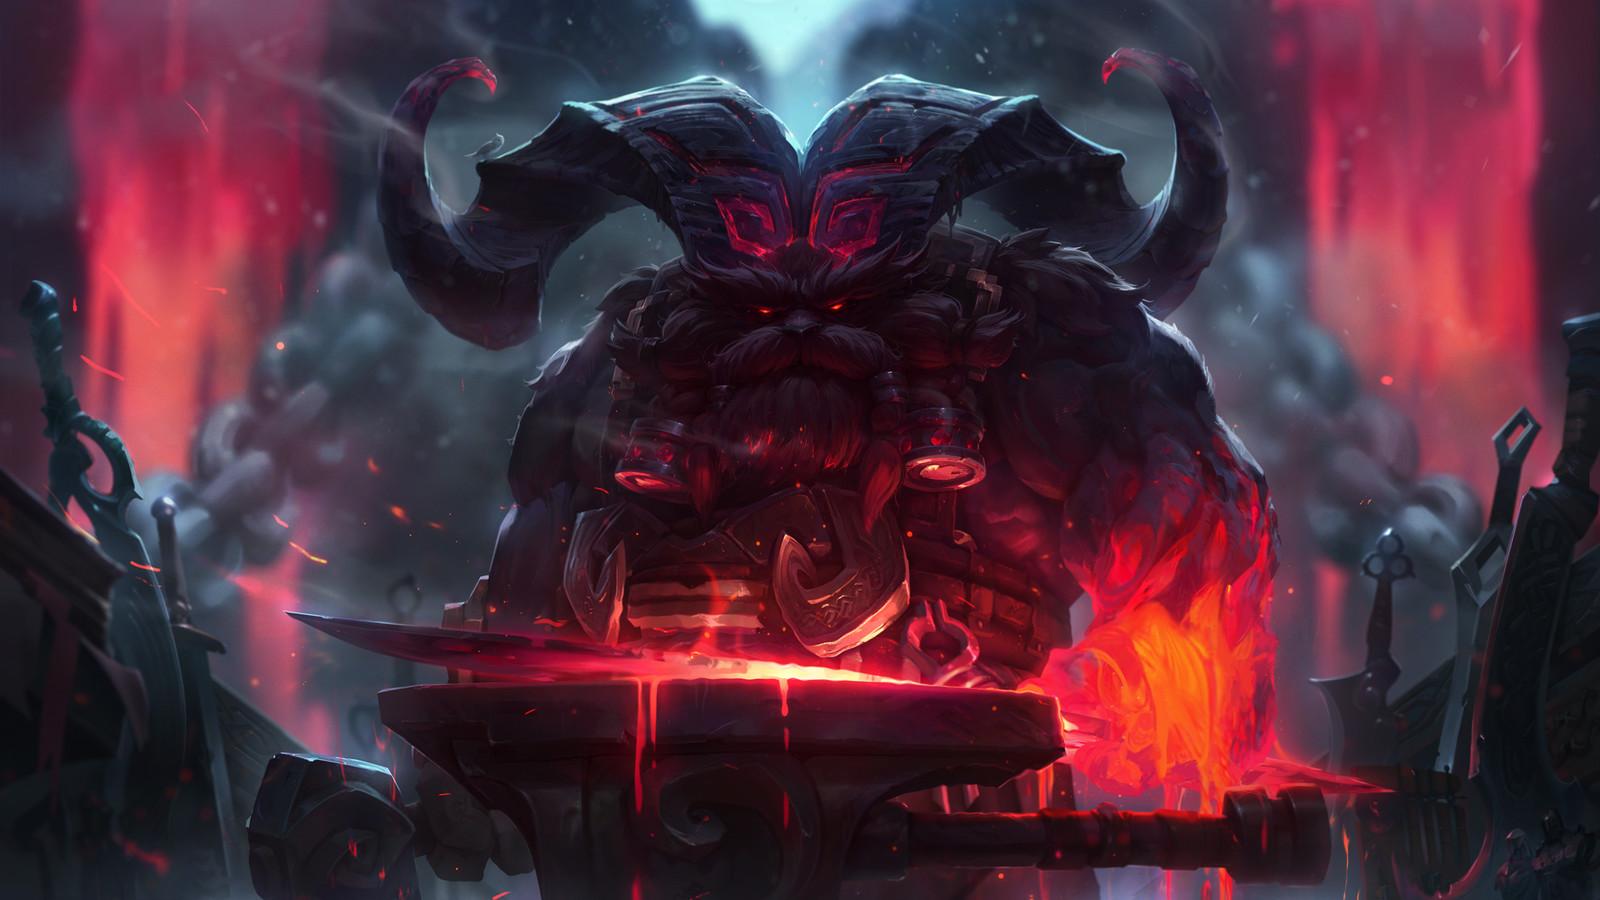 Ornn, the Fire Below the Mountain